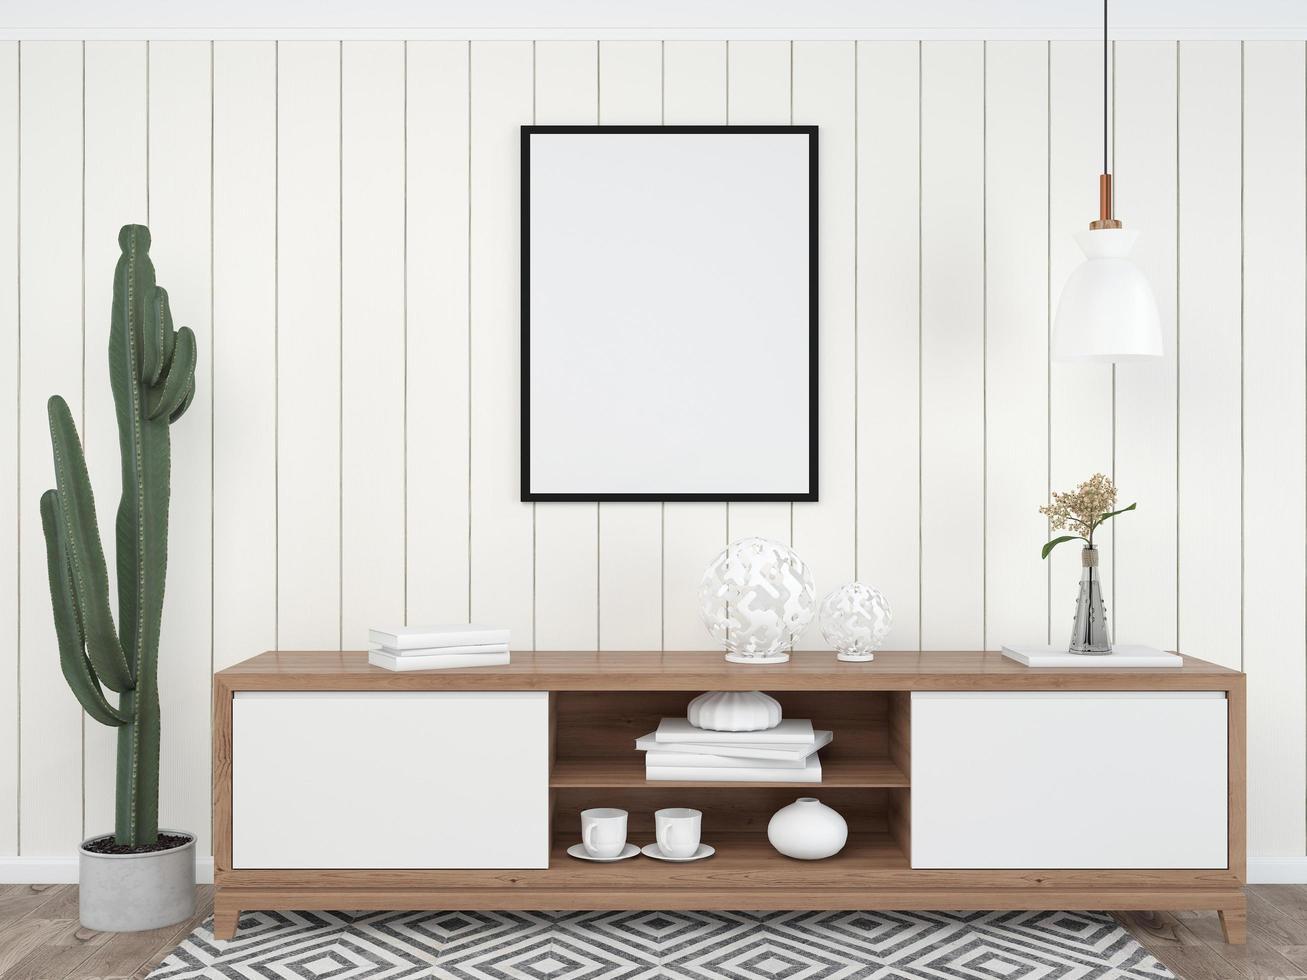 Mesa interior de sala de estar con plantilla de maqueta de marco de imagen 3d foto